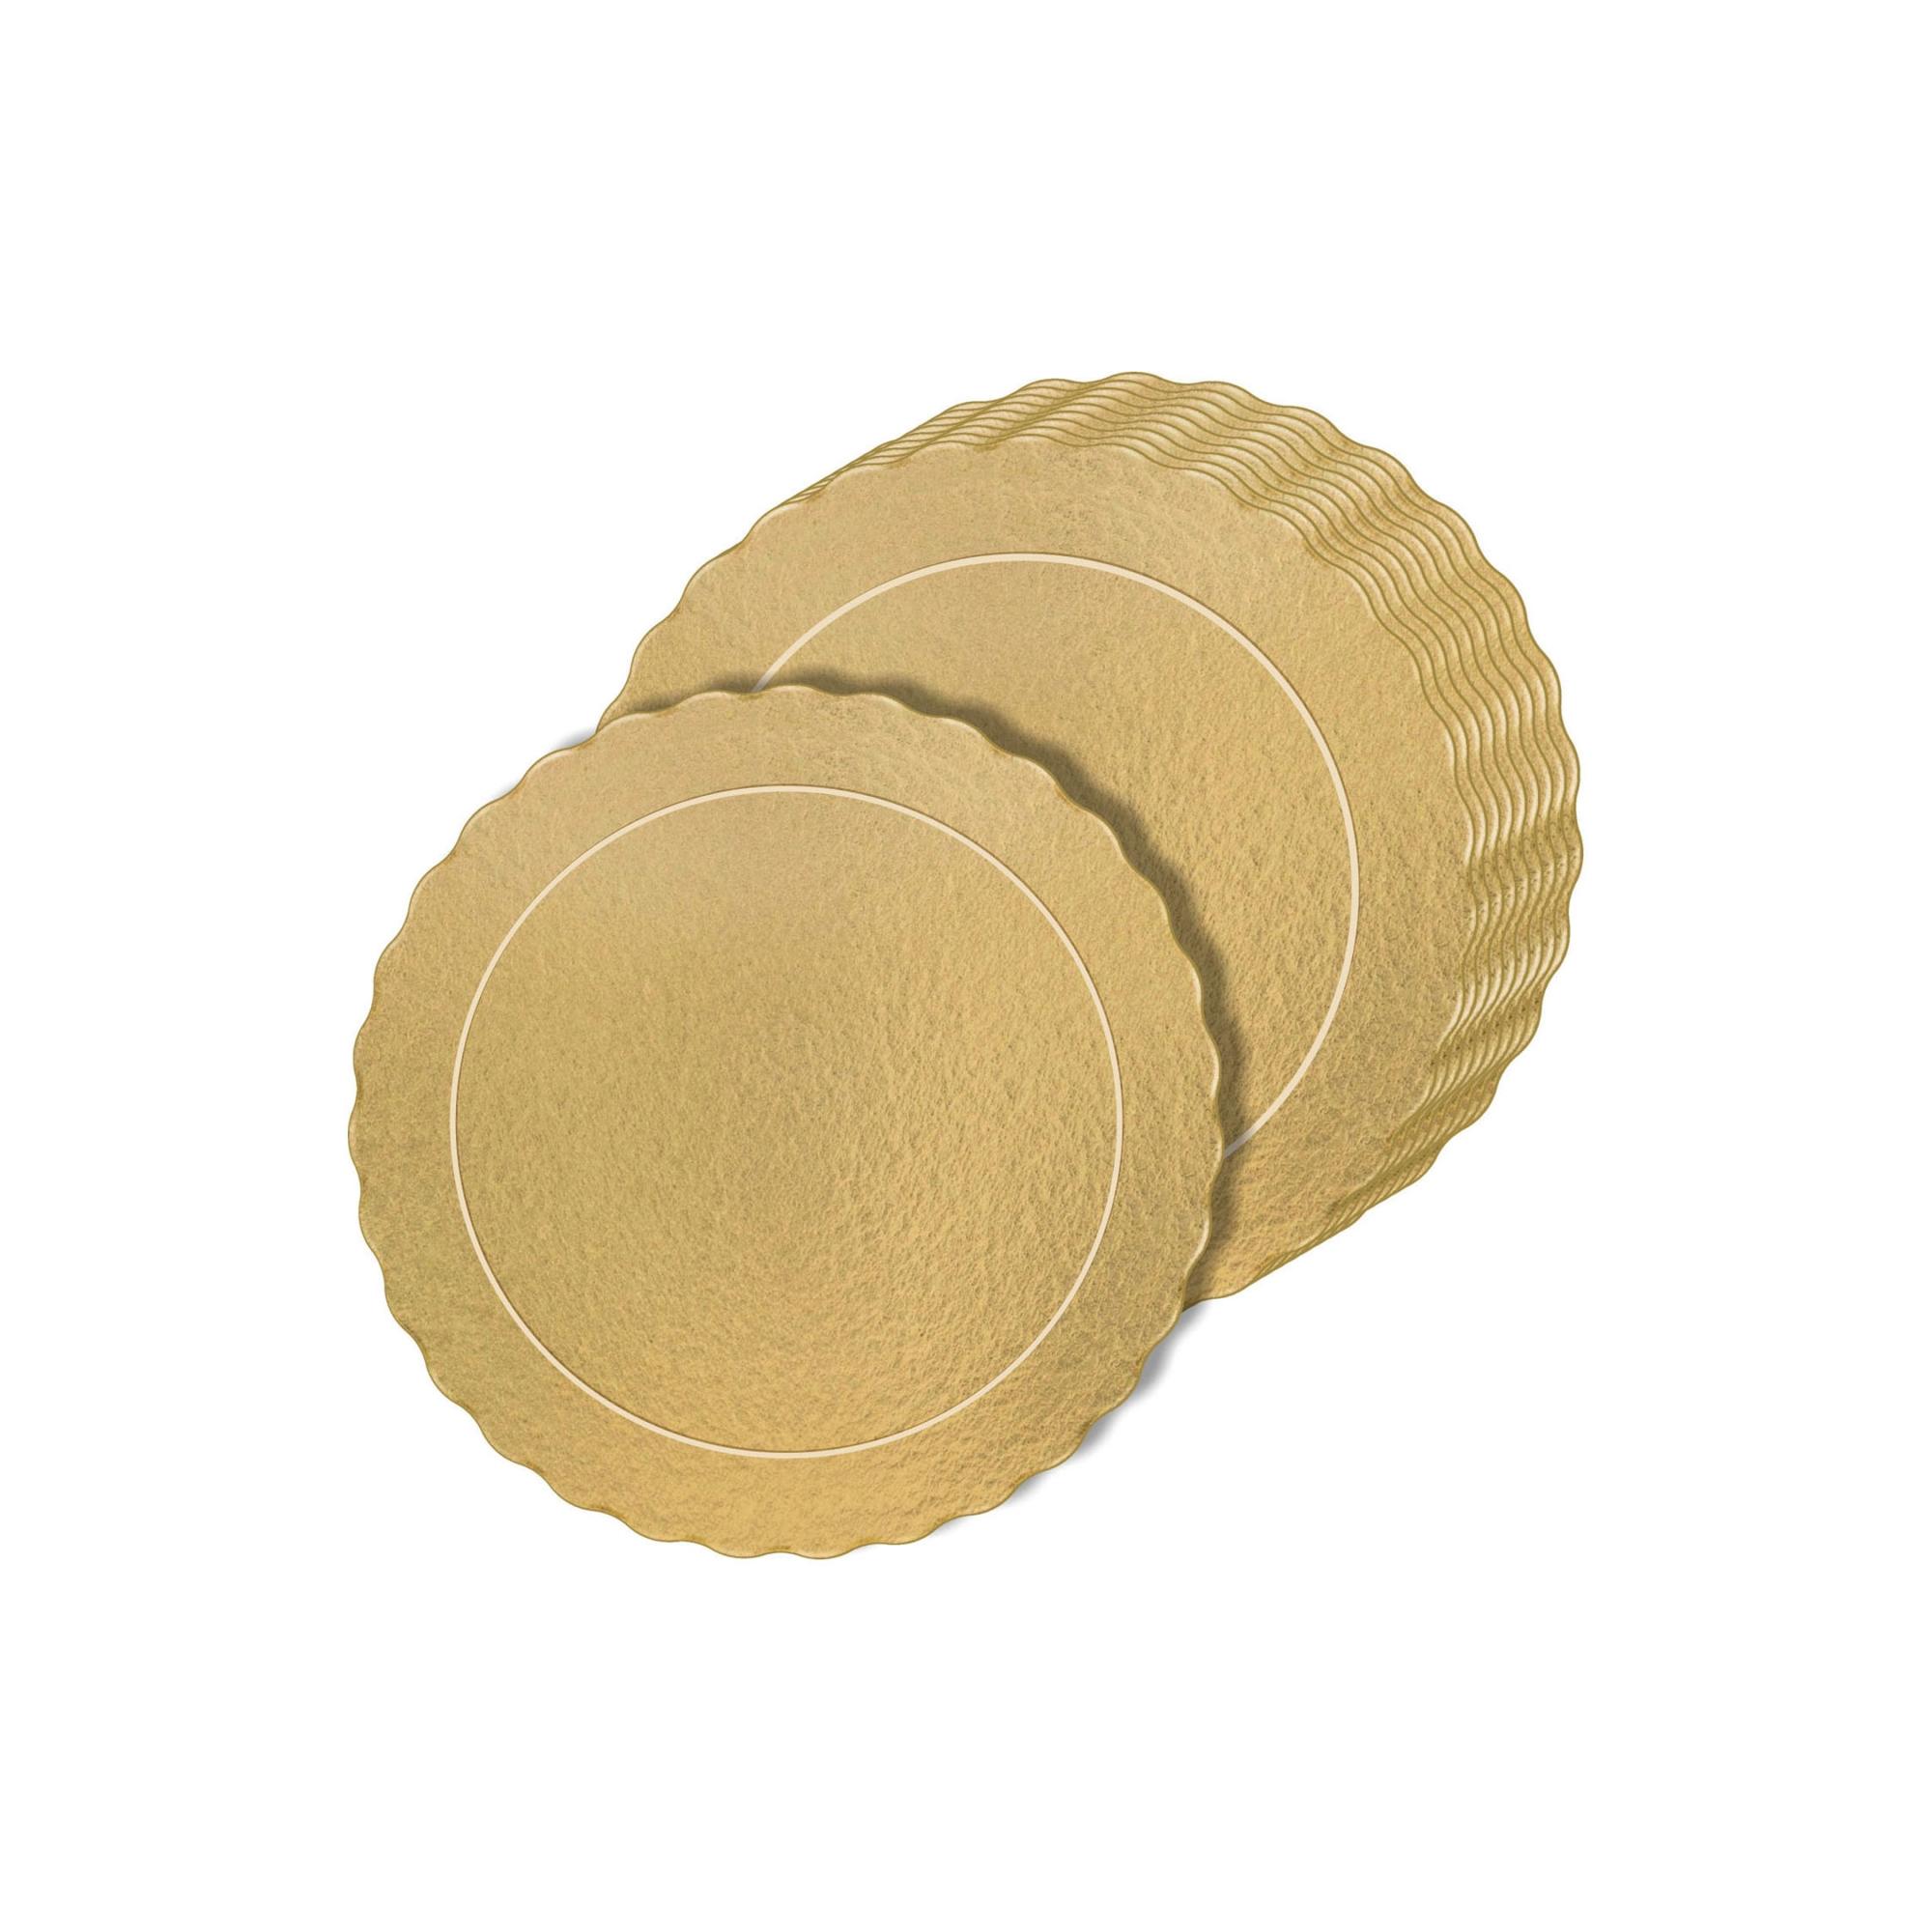 100 Bases Laminadas, Suporte P/ Bolo, Cake Board, 20cm - Ouro